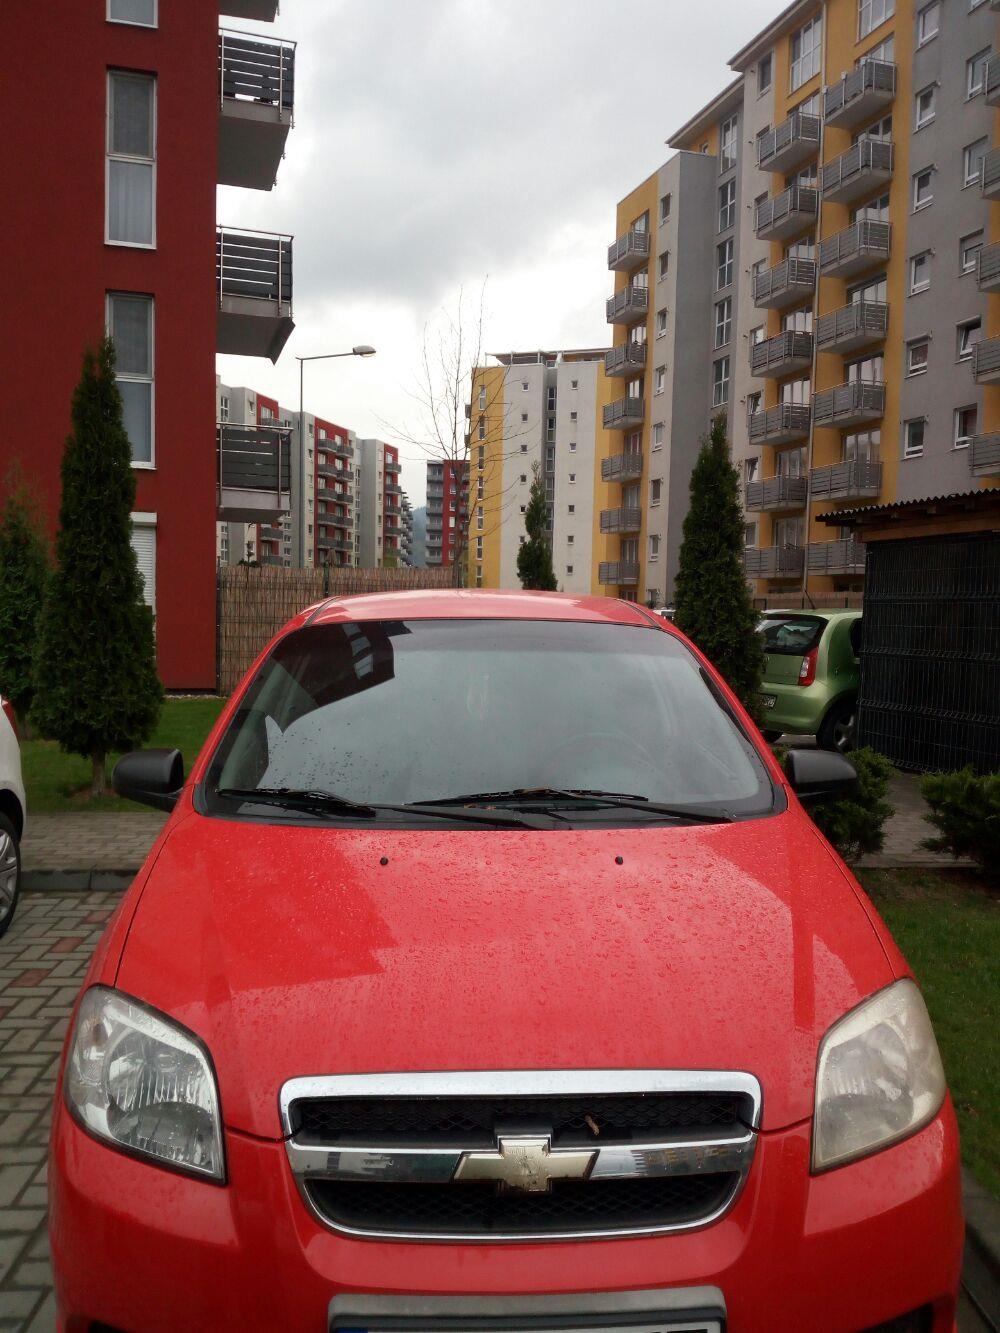 Chevrolet  - imagine 2